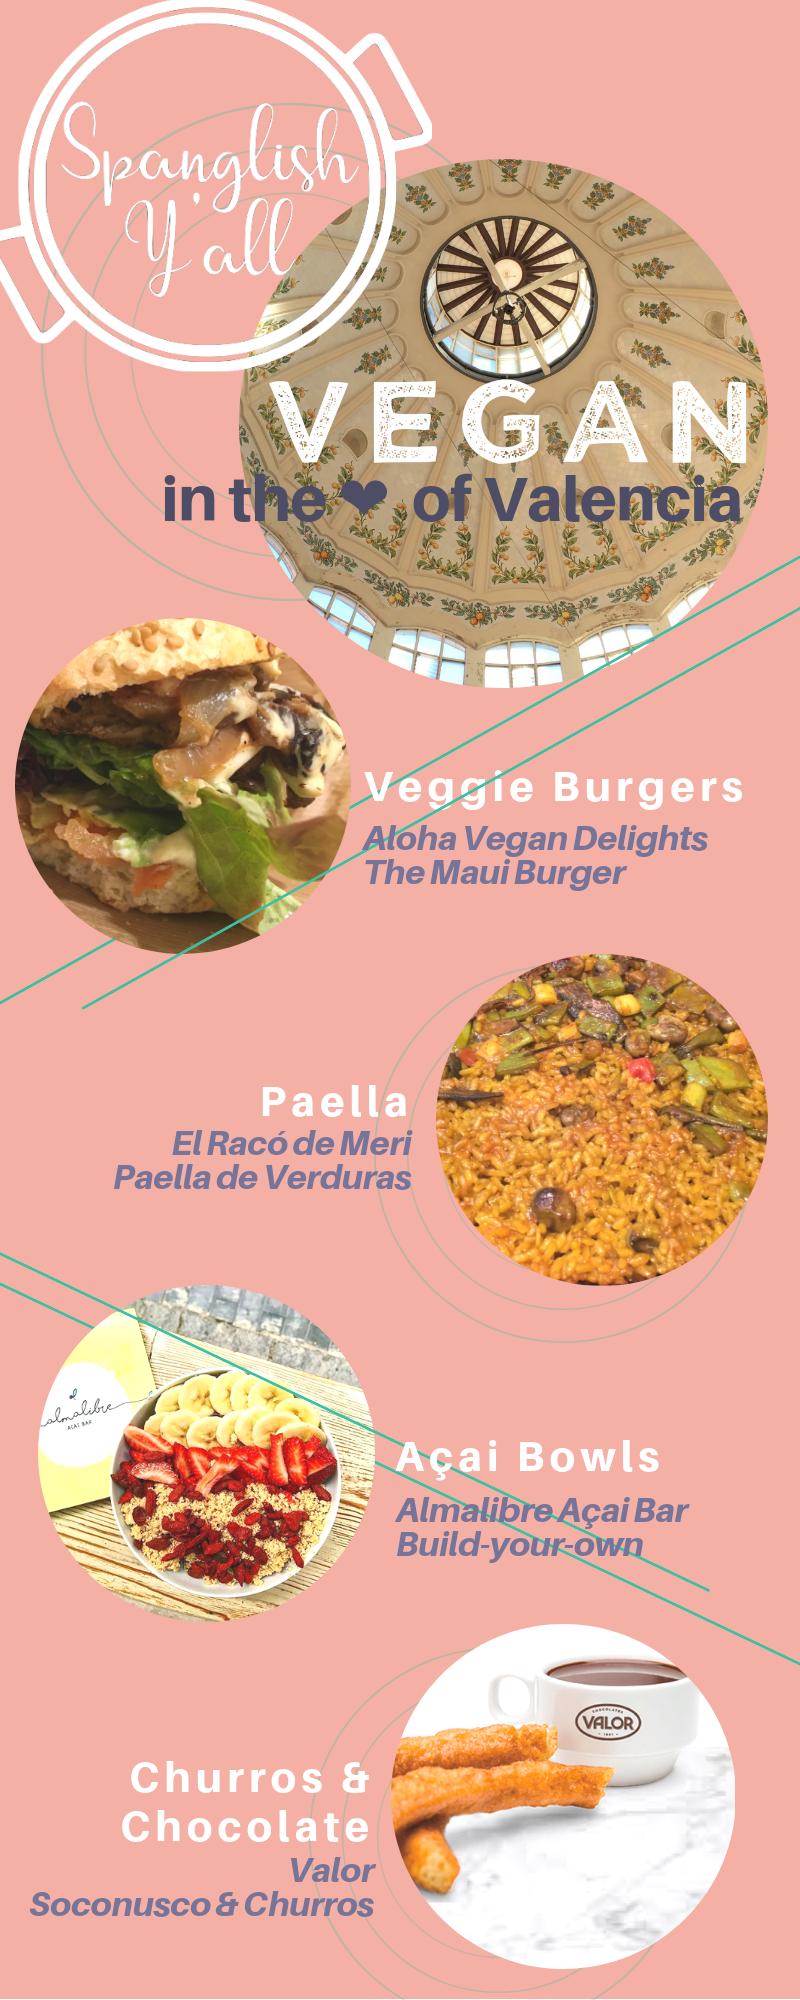 Vegan in Valencia infographic